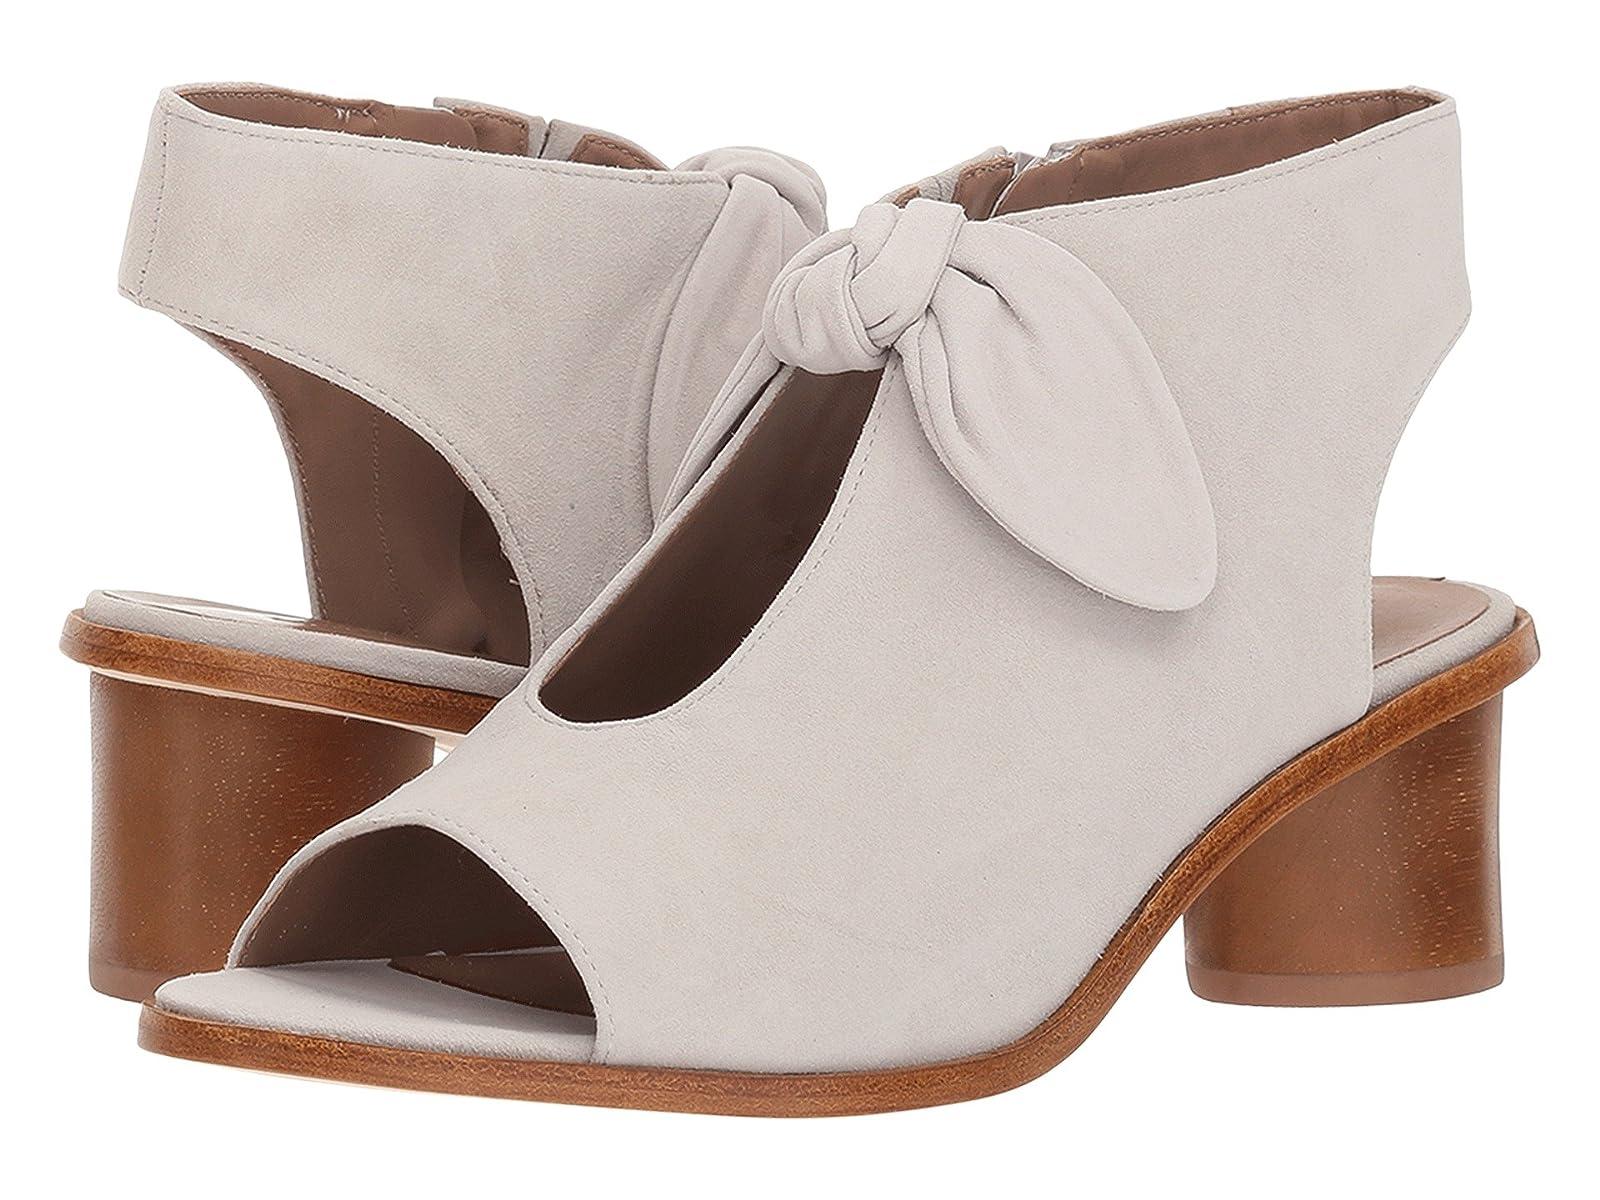 Bernardo Luna BootieAtmospheric grades have affordable shoes